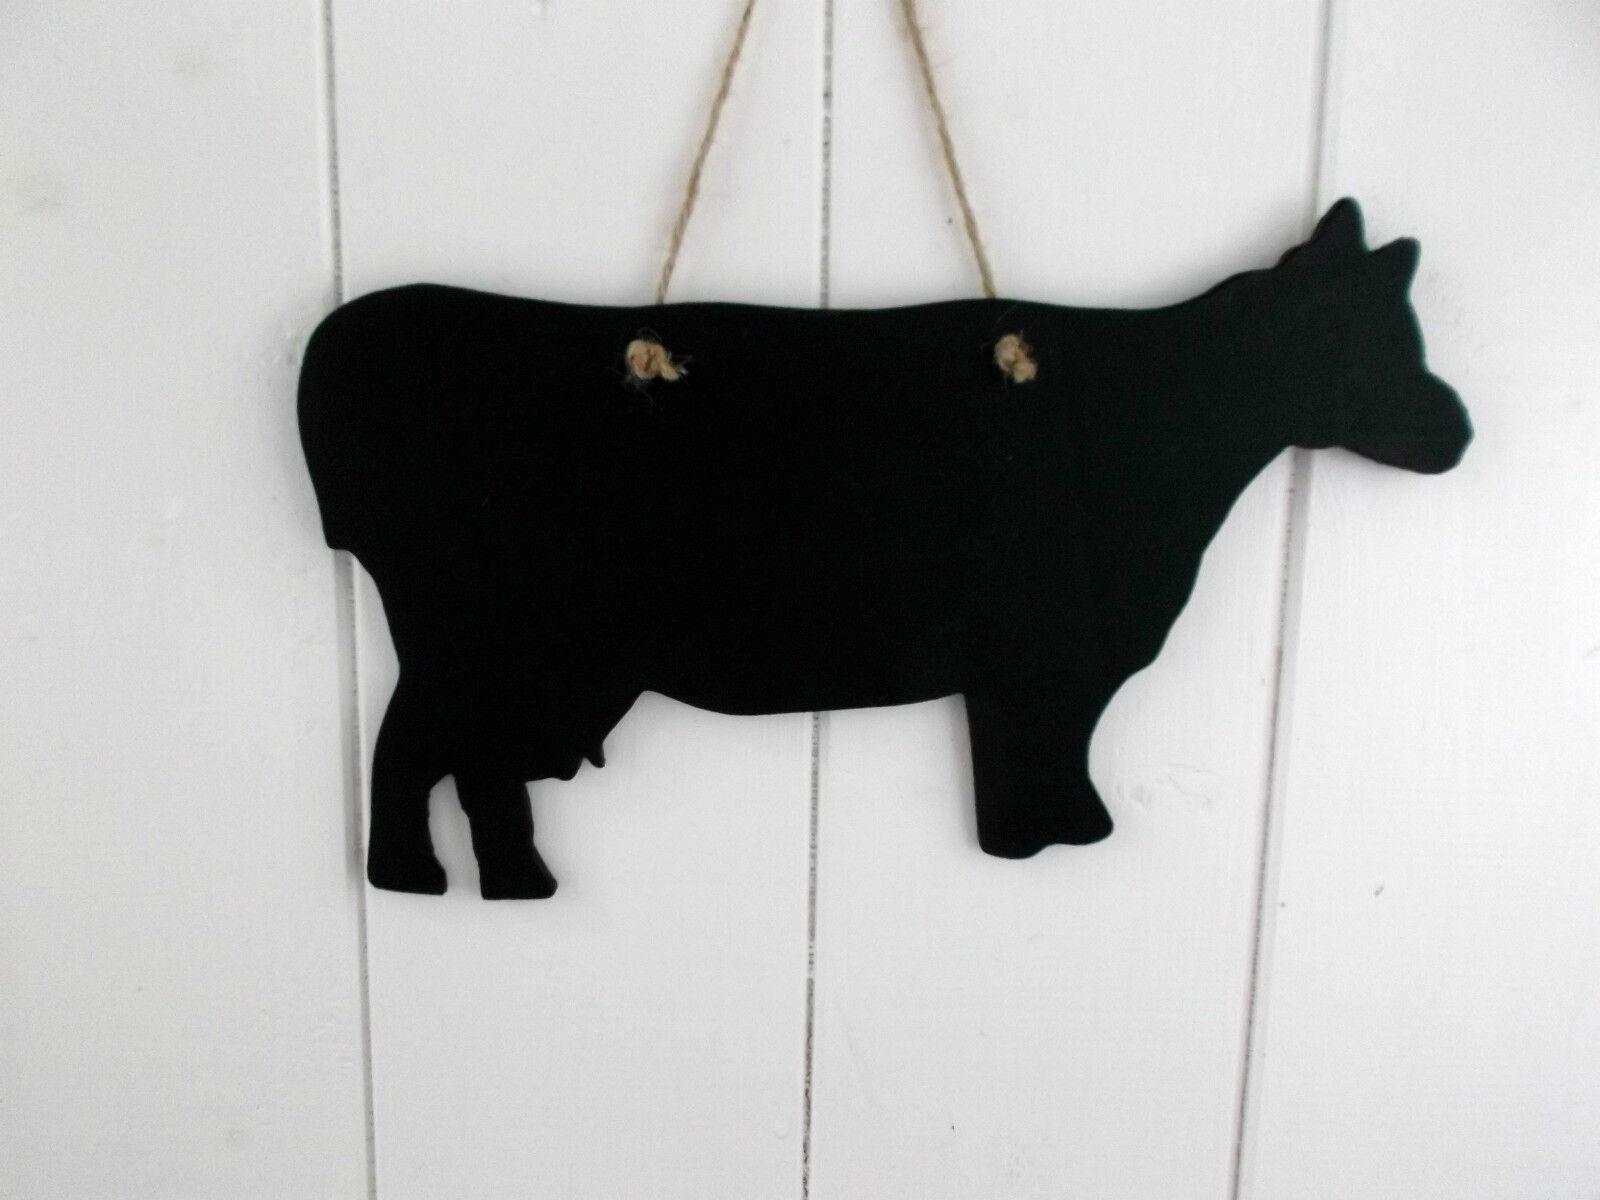 dairy cow shape chalkboard blackboard christmas shop sign farm